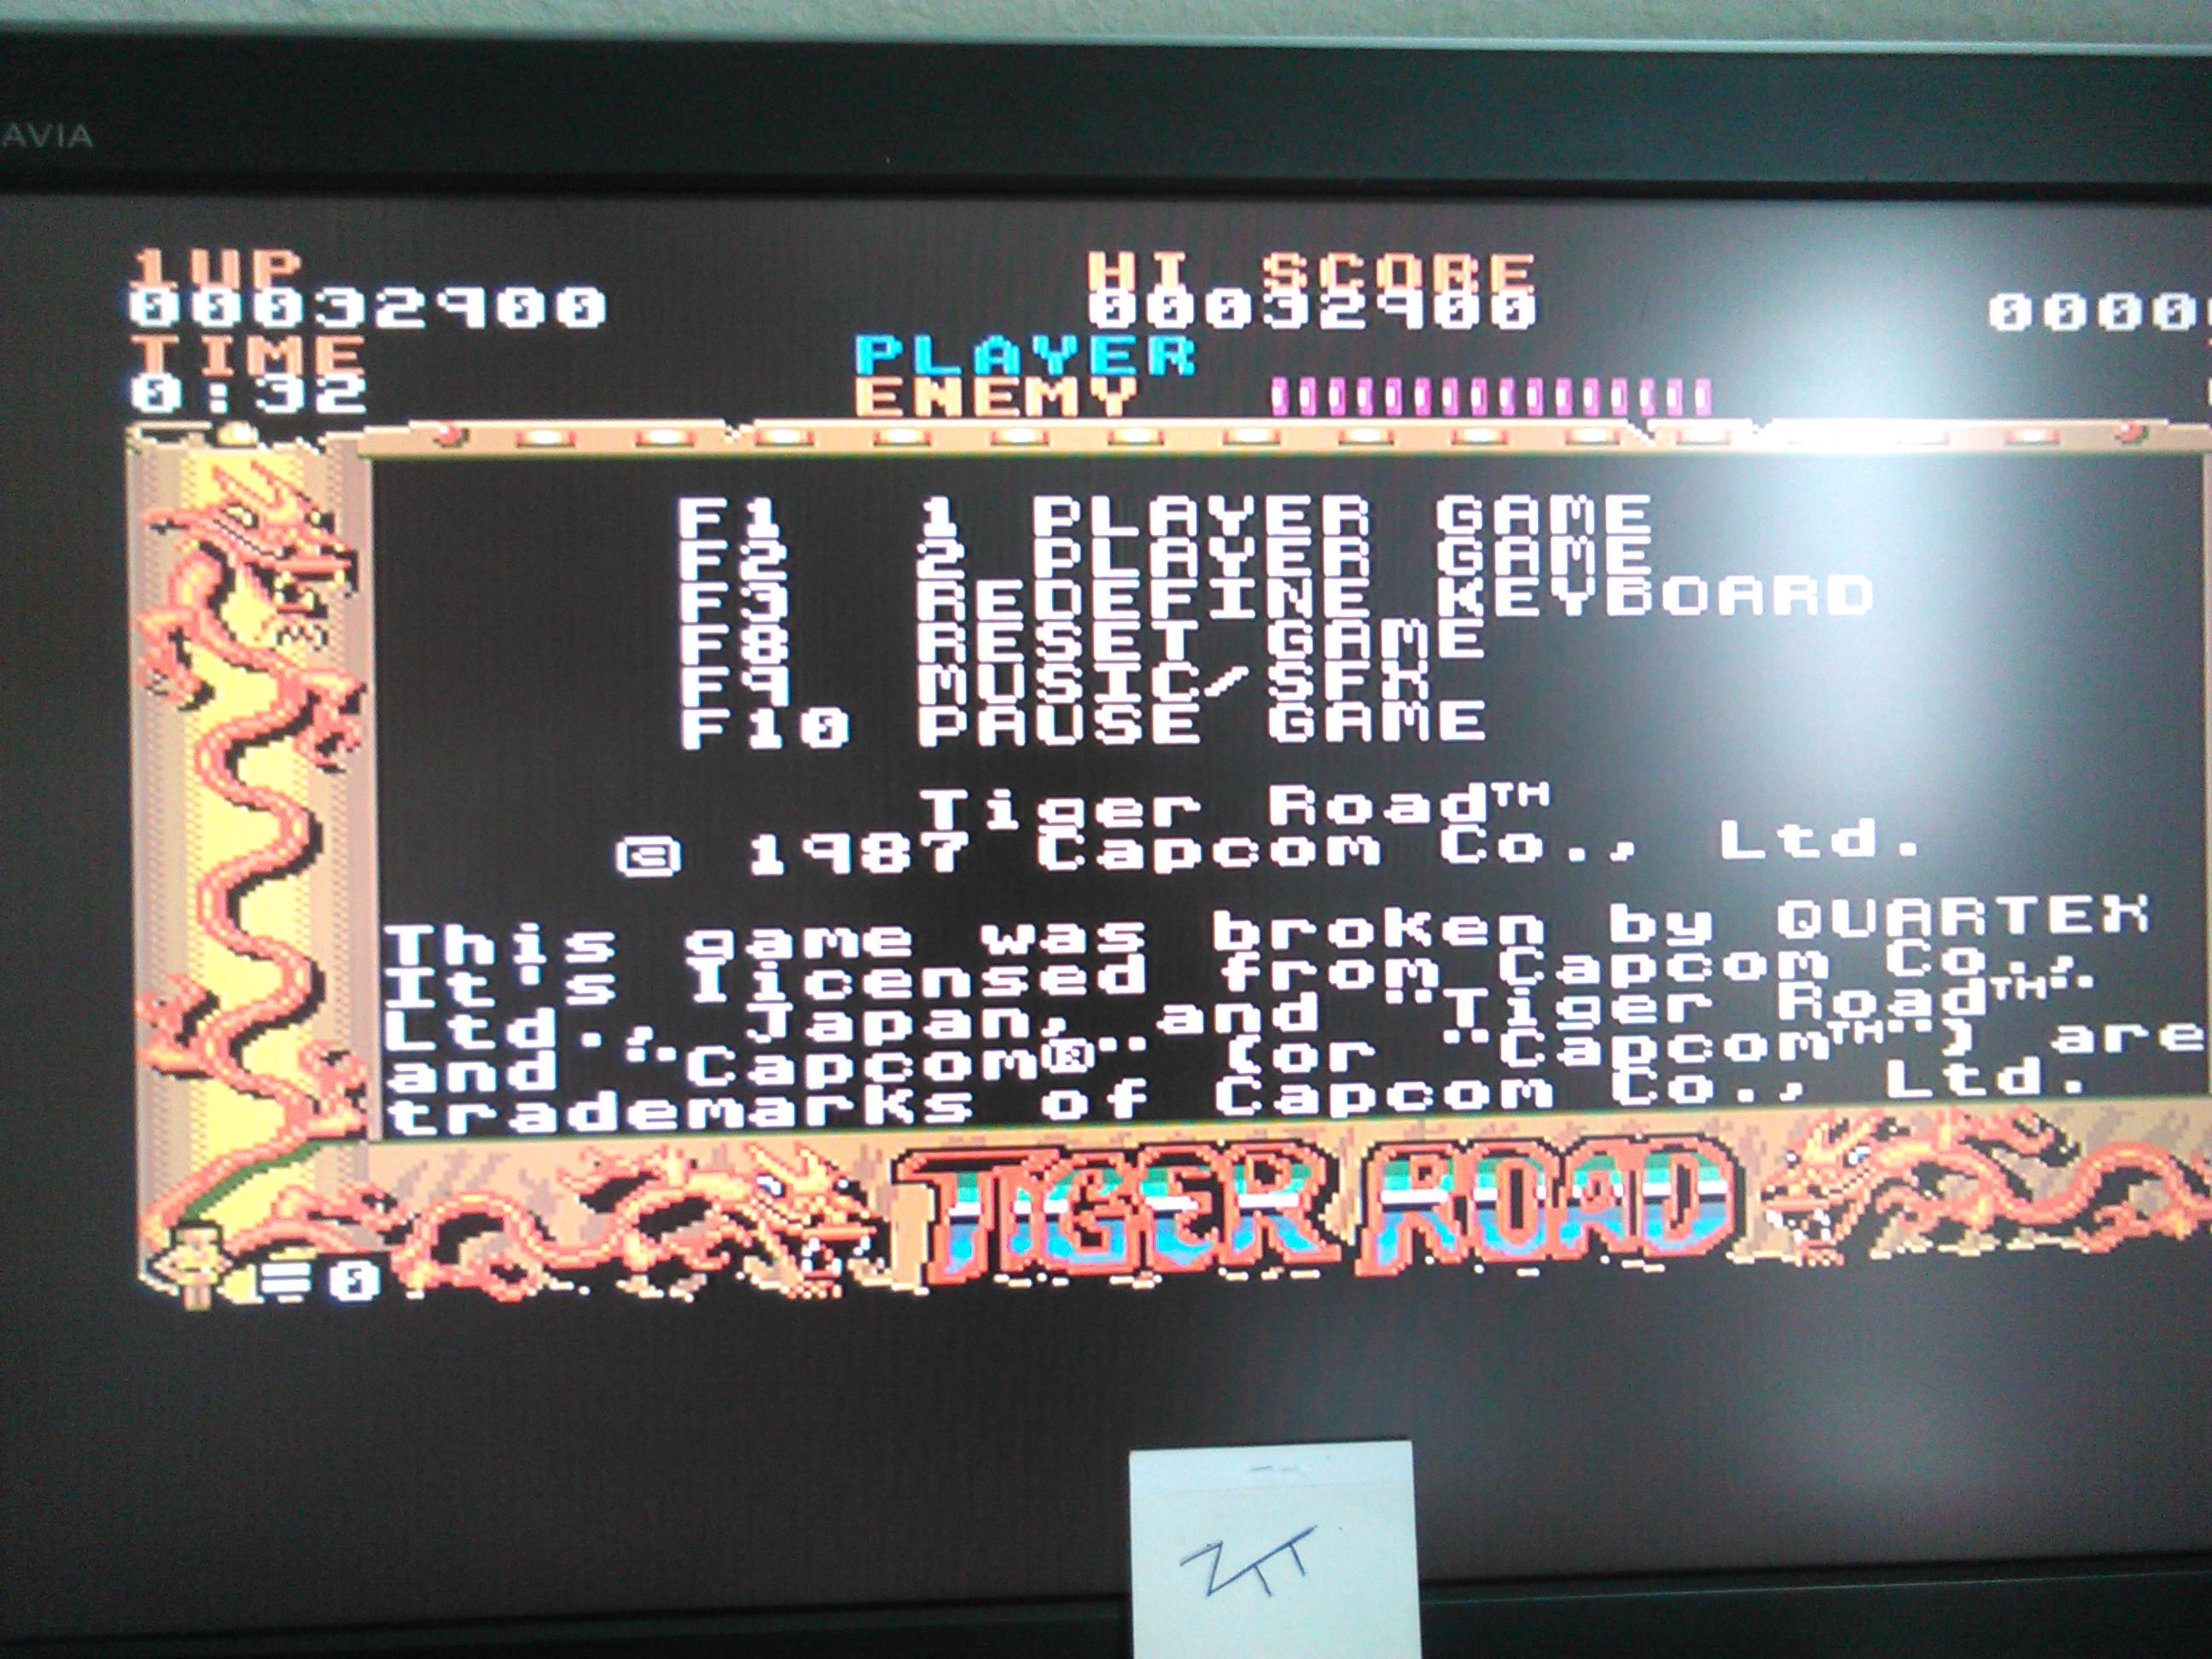 Frankie: Tiger Road (Amiga) 32,900 points on 2016-11-13 05:42:19